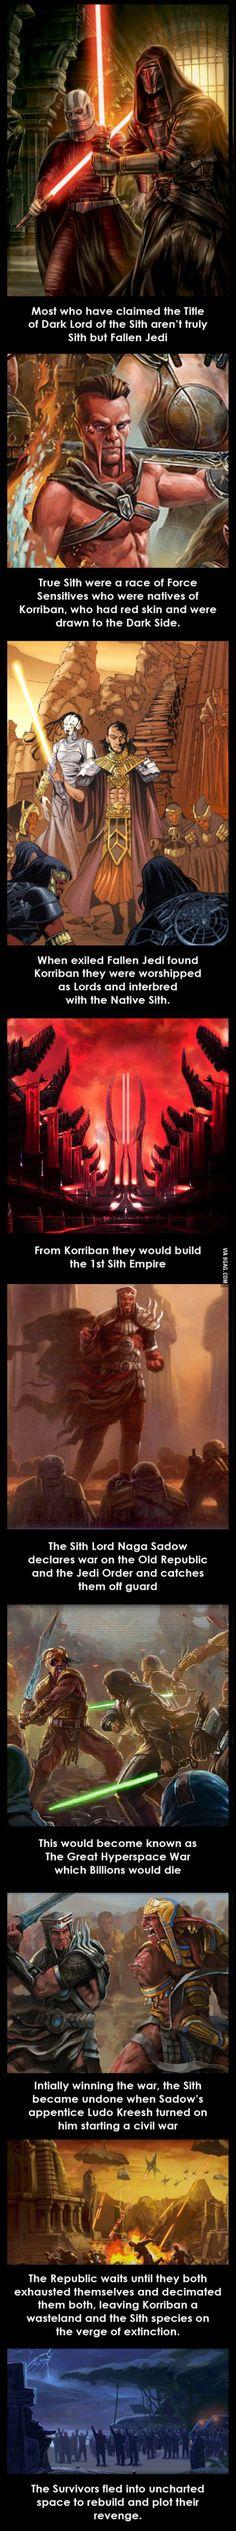 The Origins Of The Sith (Pre-Disney)